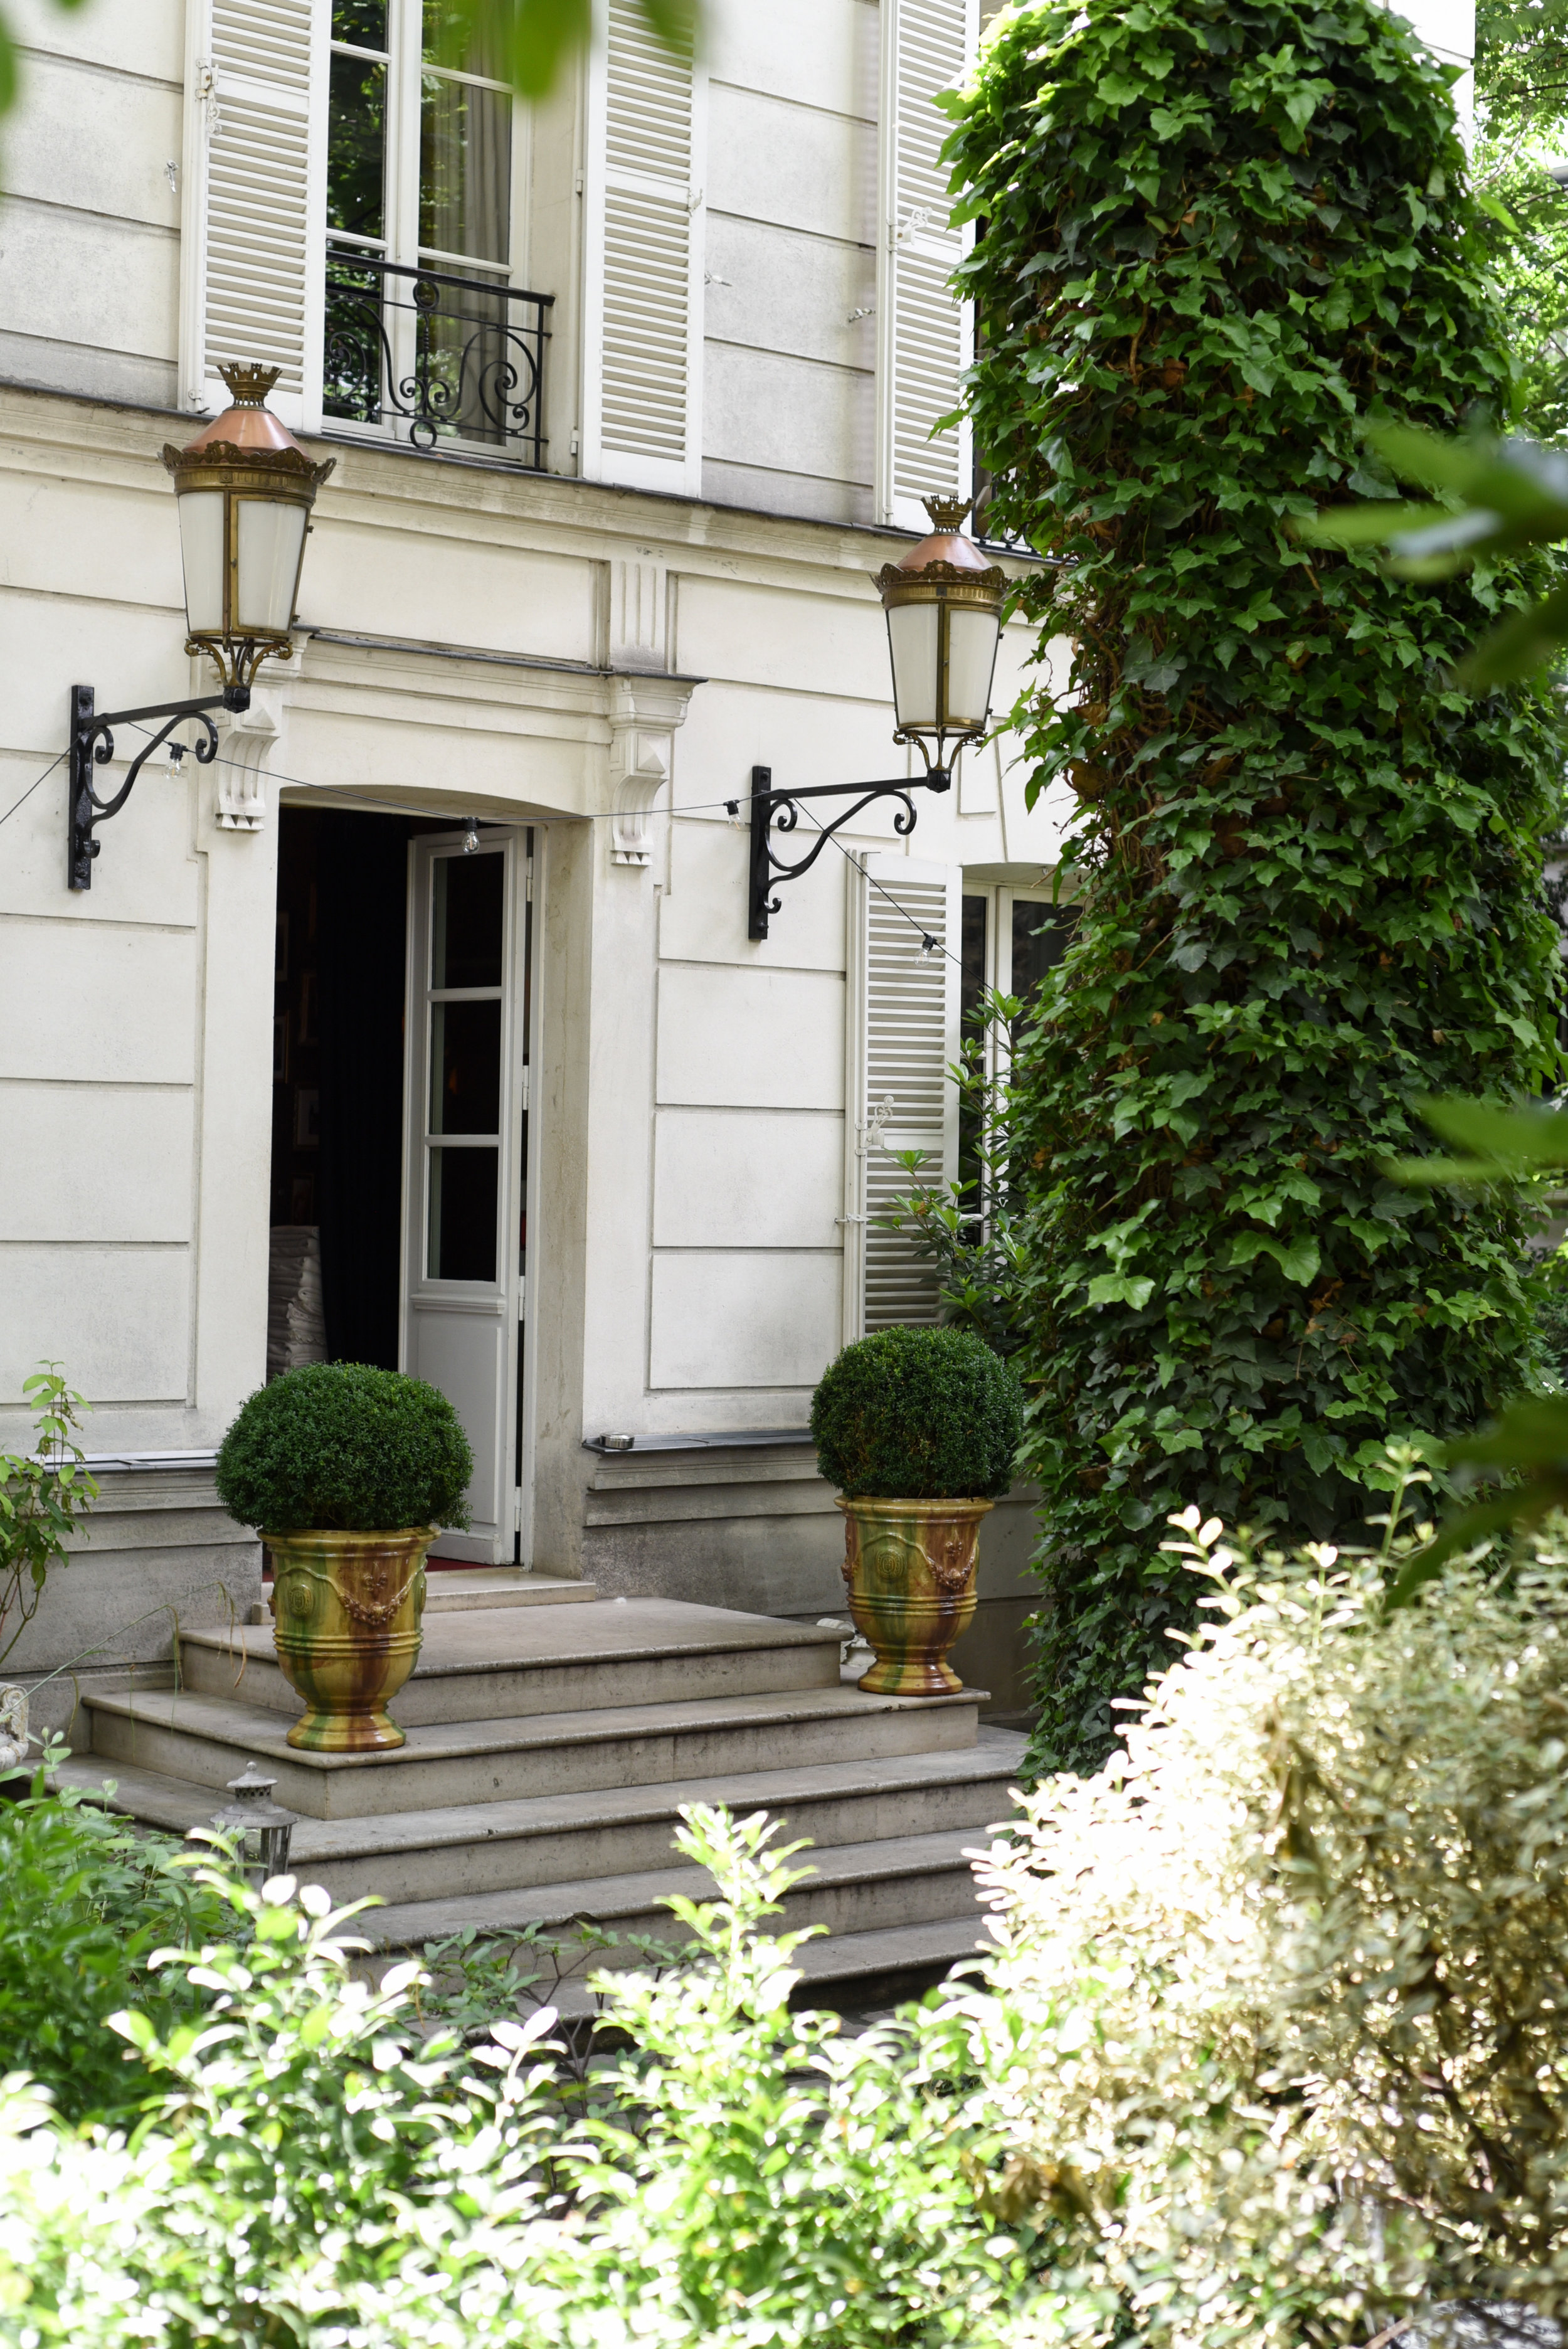 Hôtel Particulier Montmartre-1.jpg